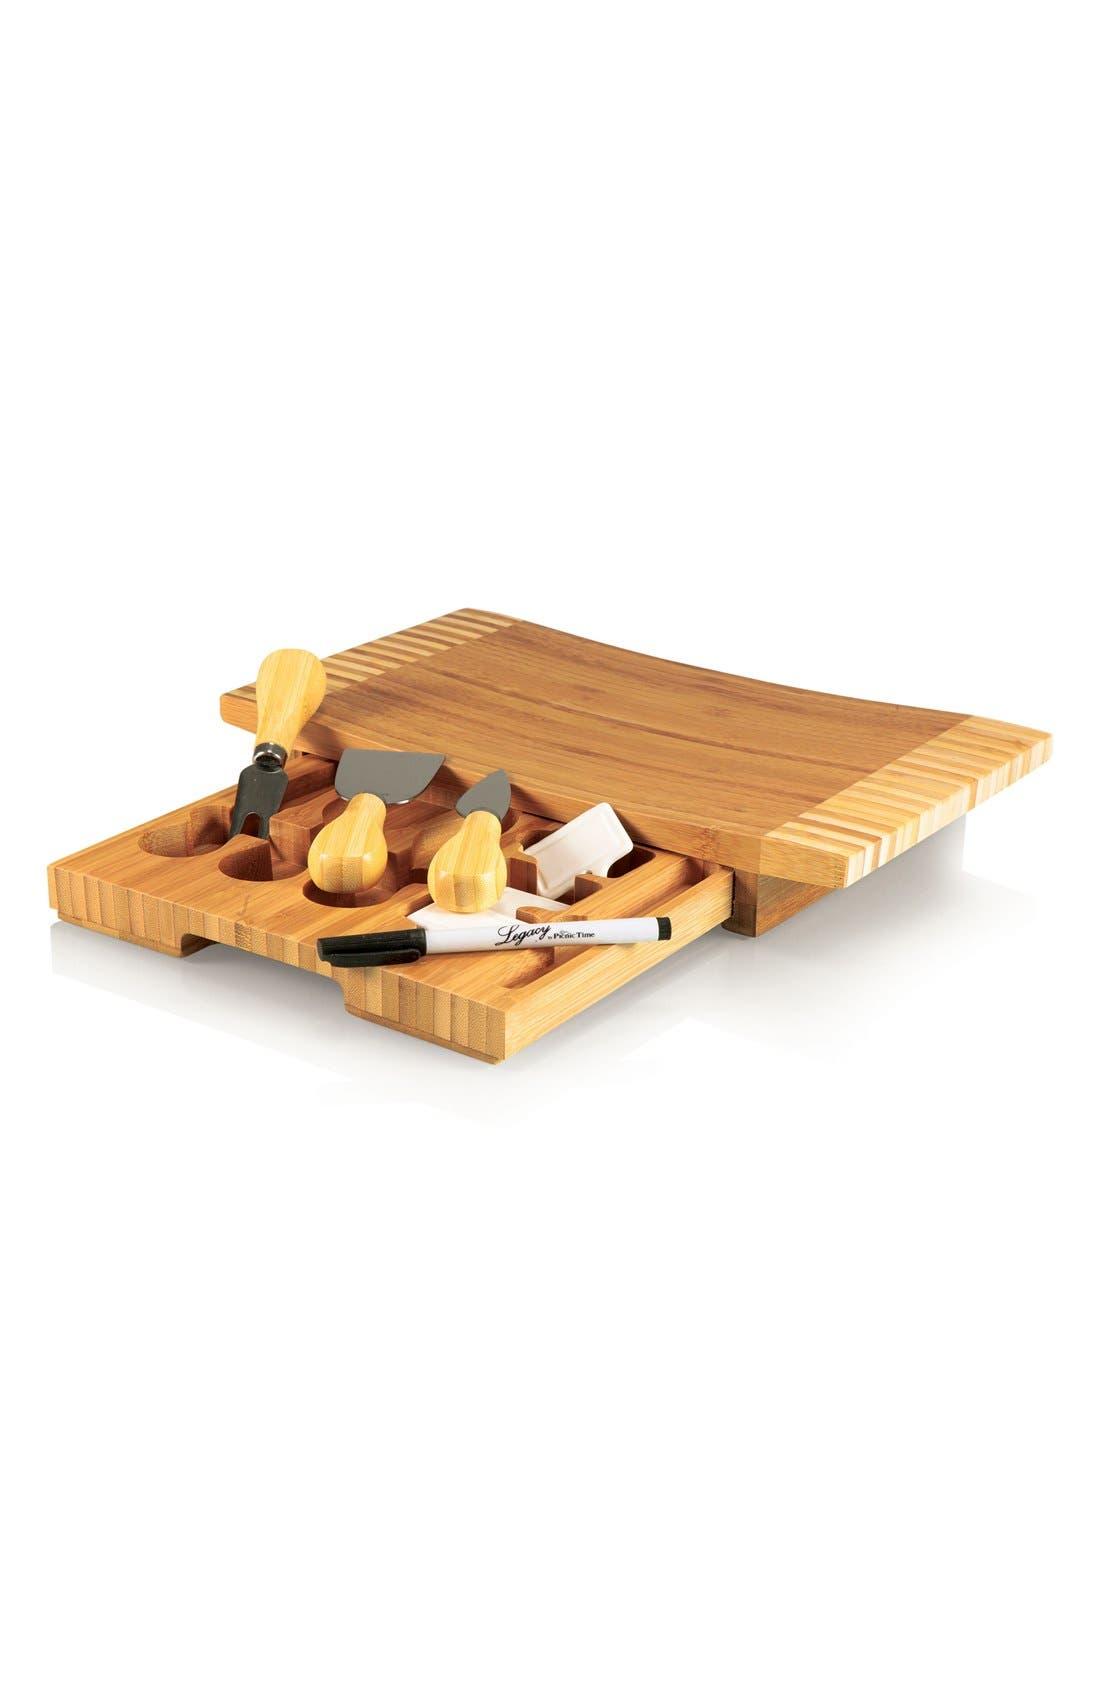 'Concavo' Cheese Board Set,                         Main,                         color, Brown